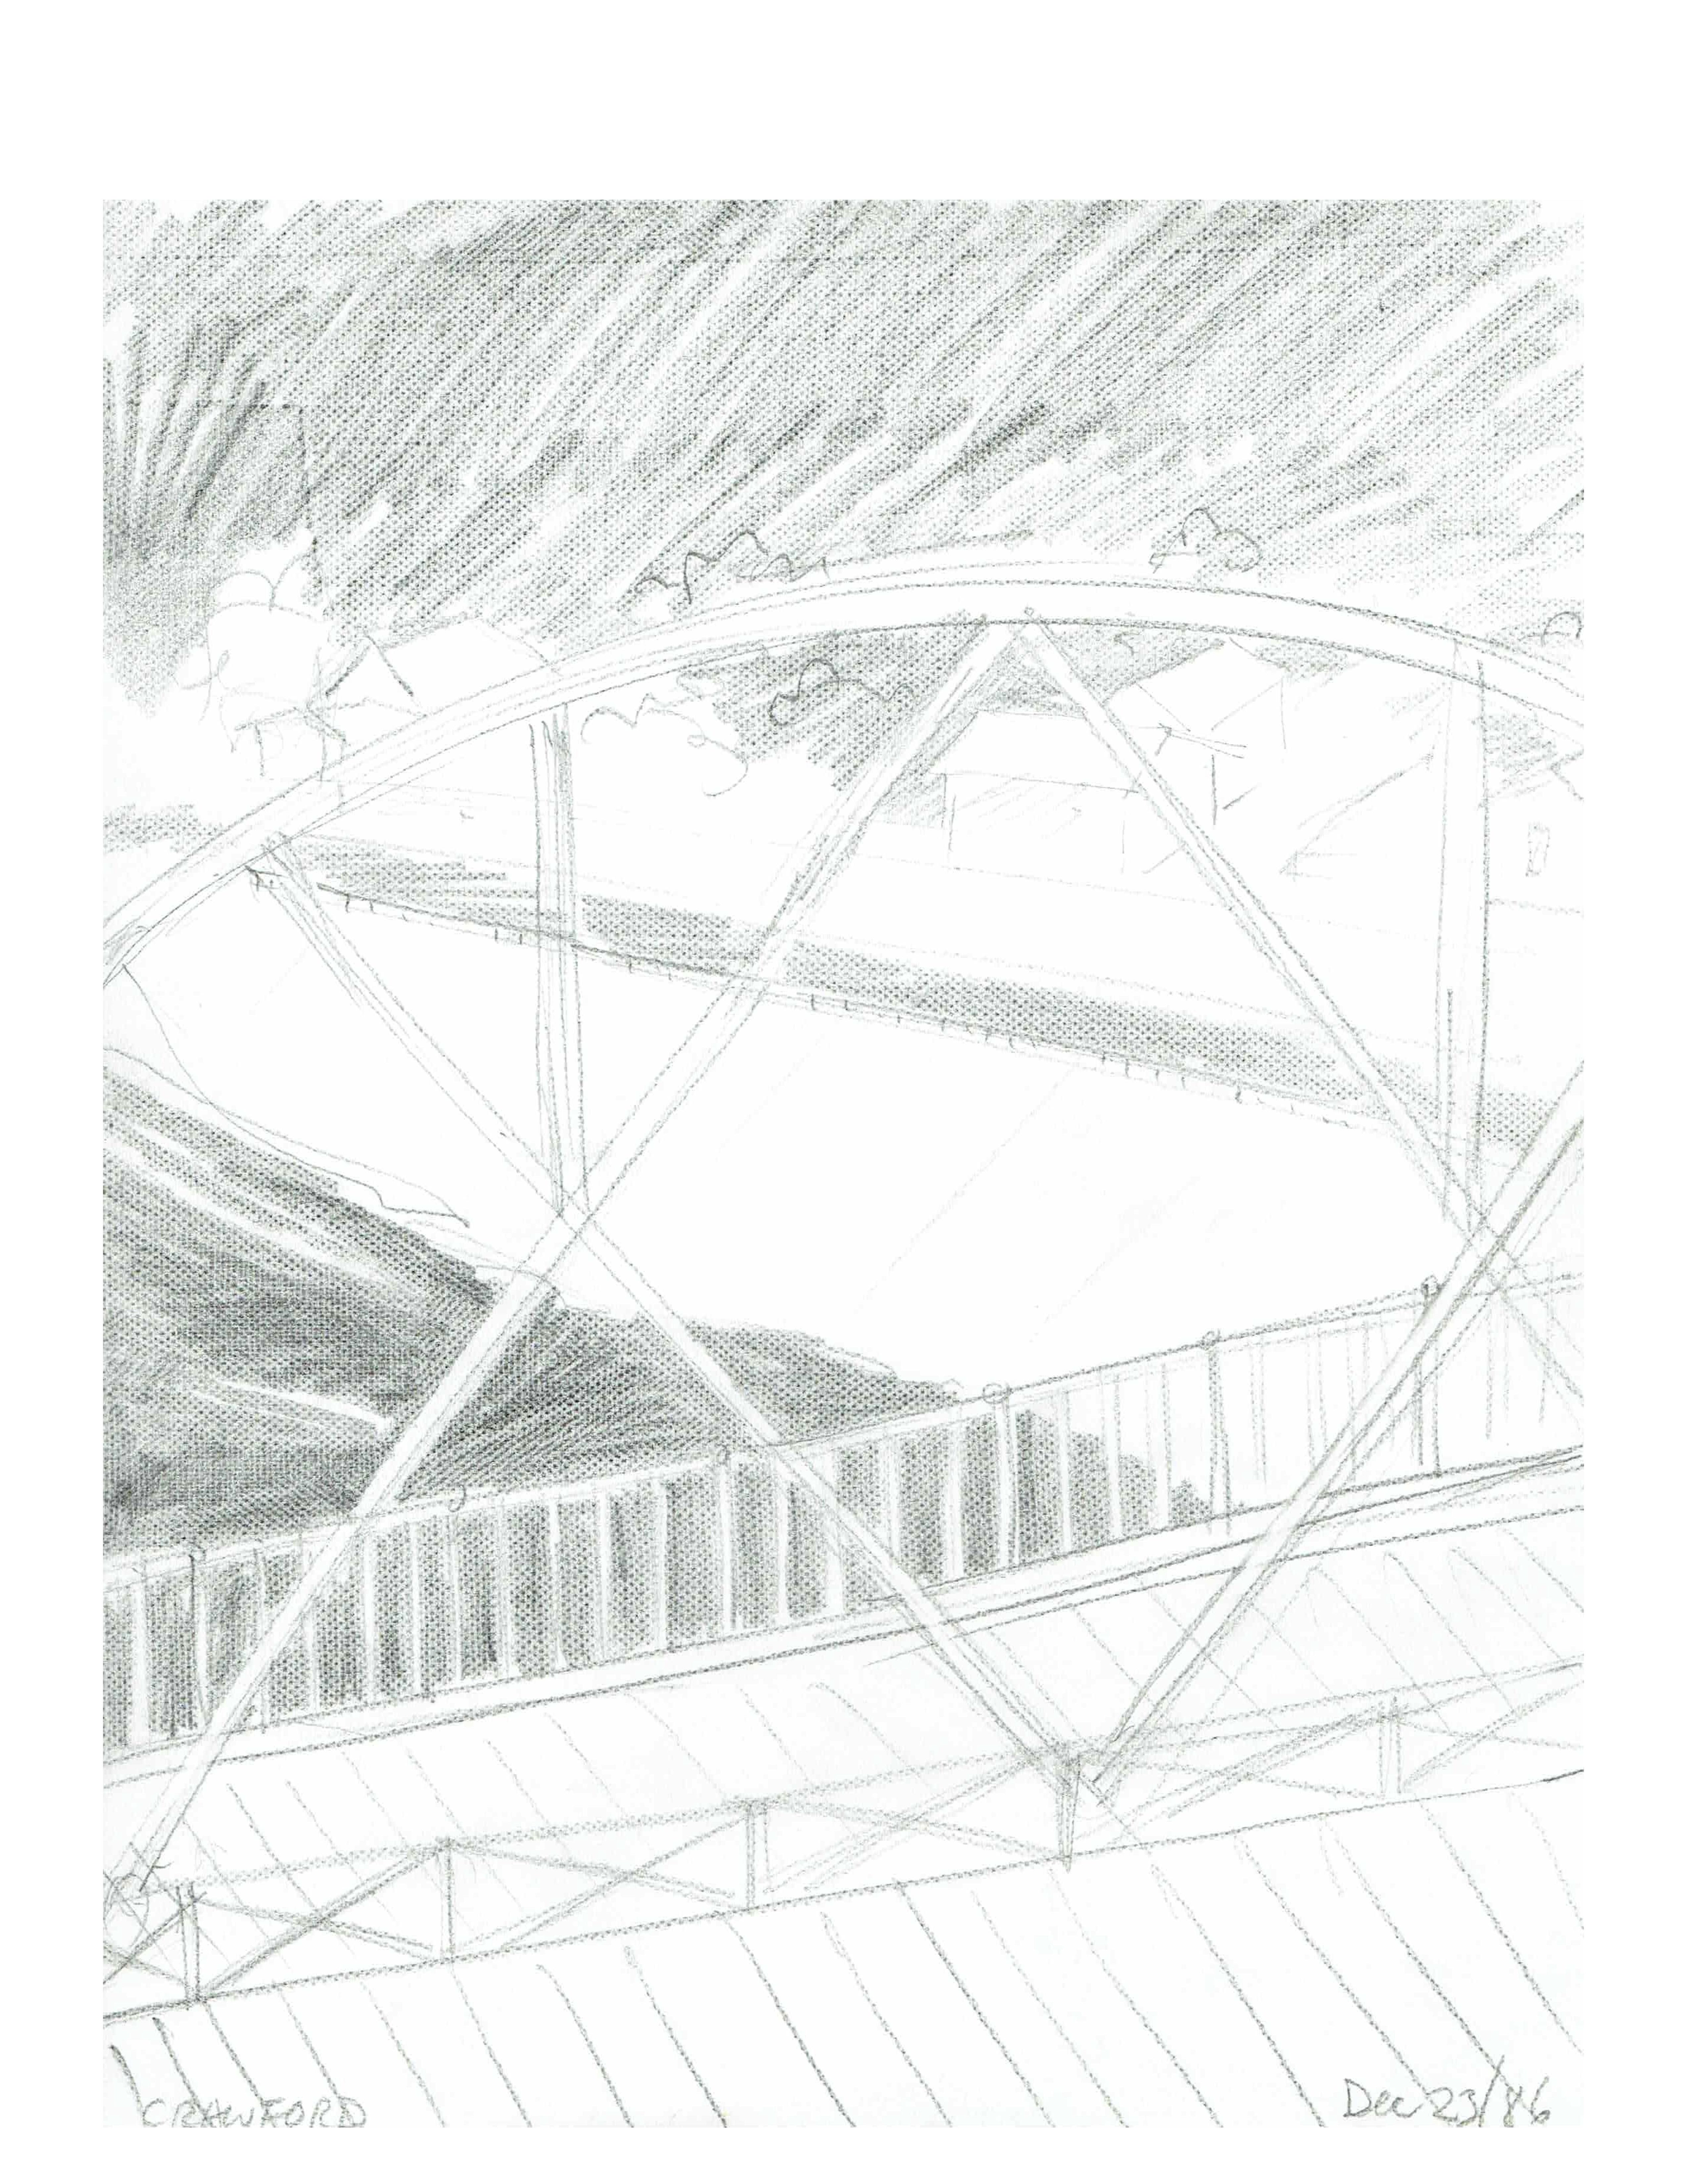 Bridge and river, Dec 23,1986, pencil on paper, 21.6 cm x 28 cm